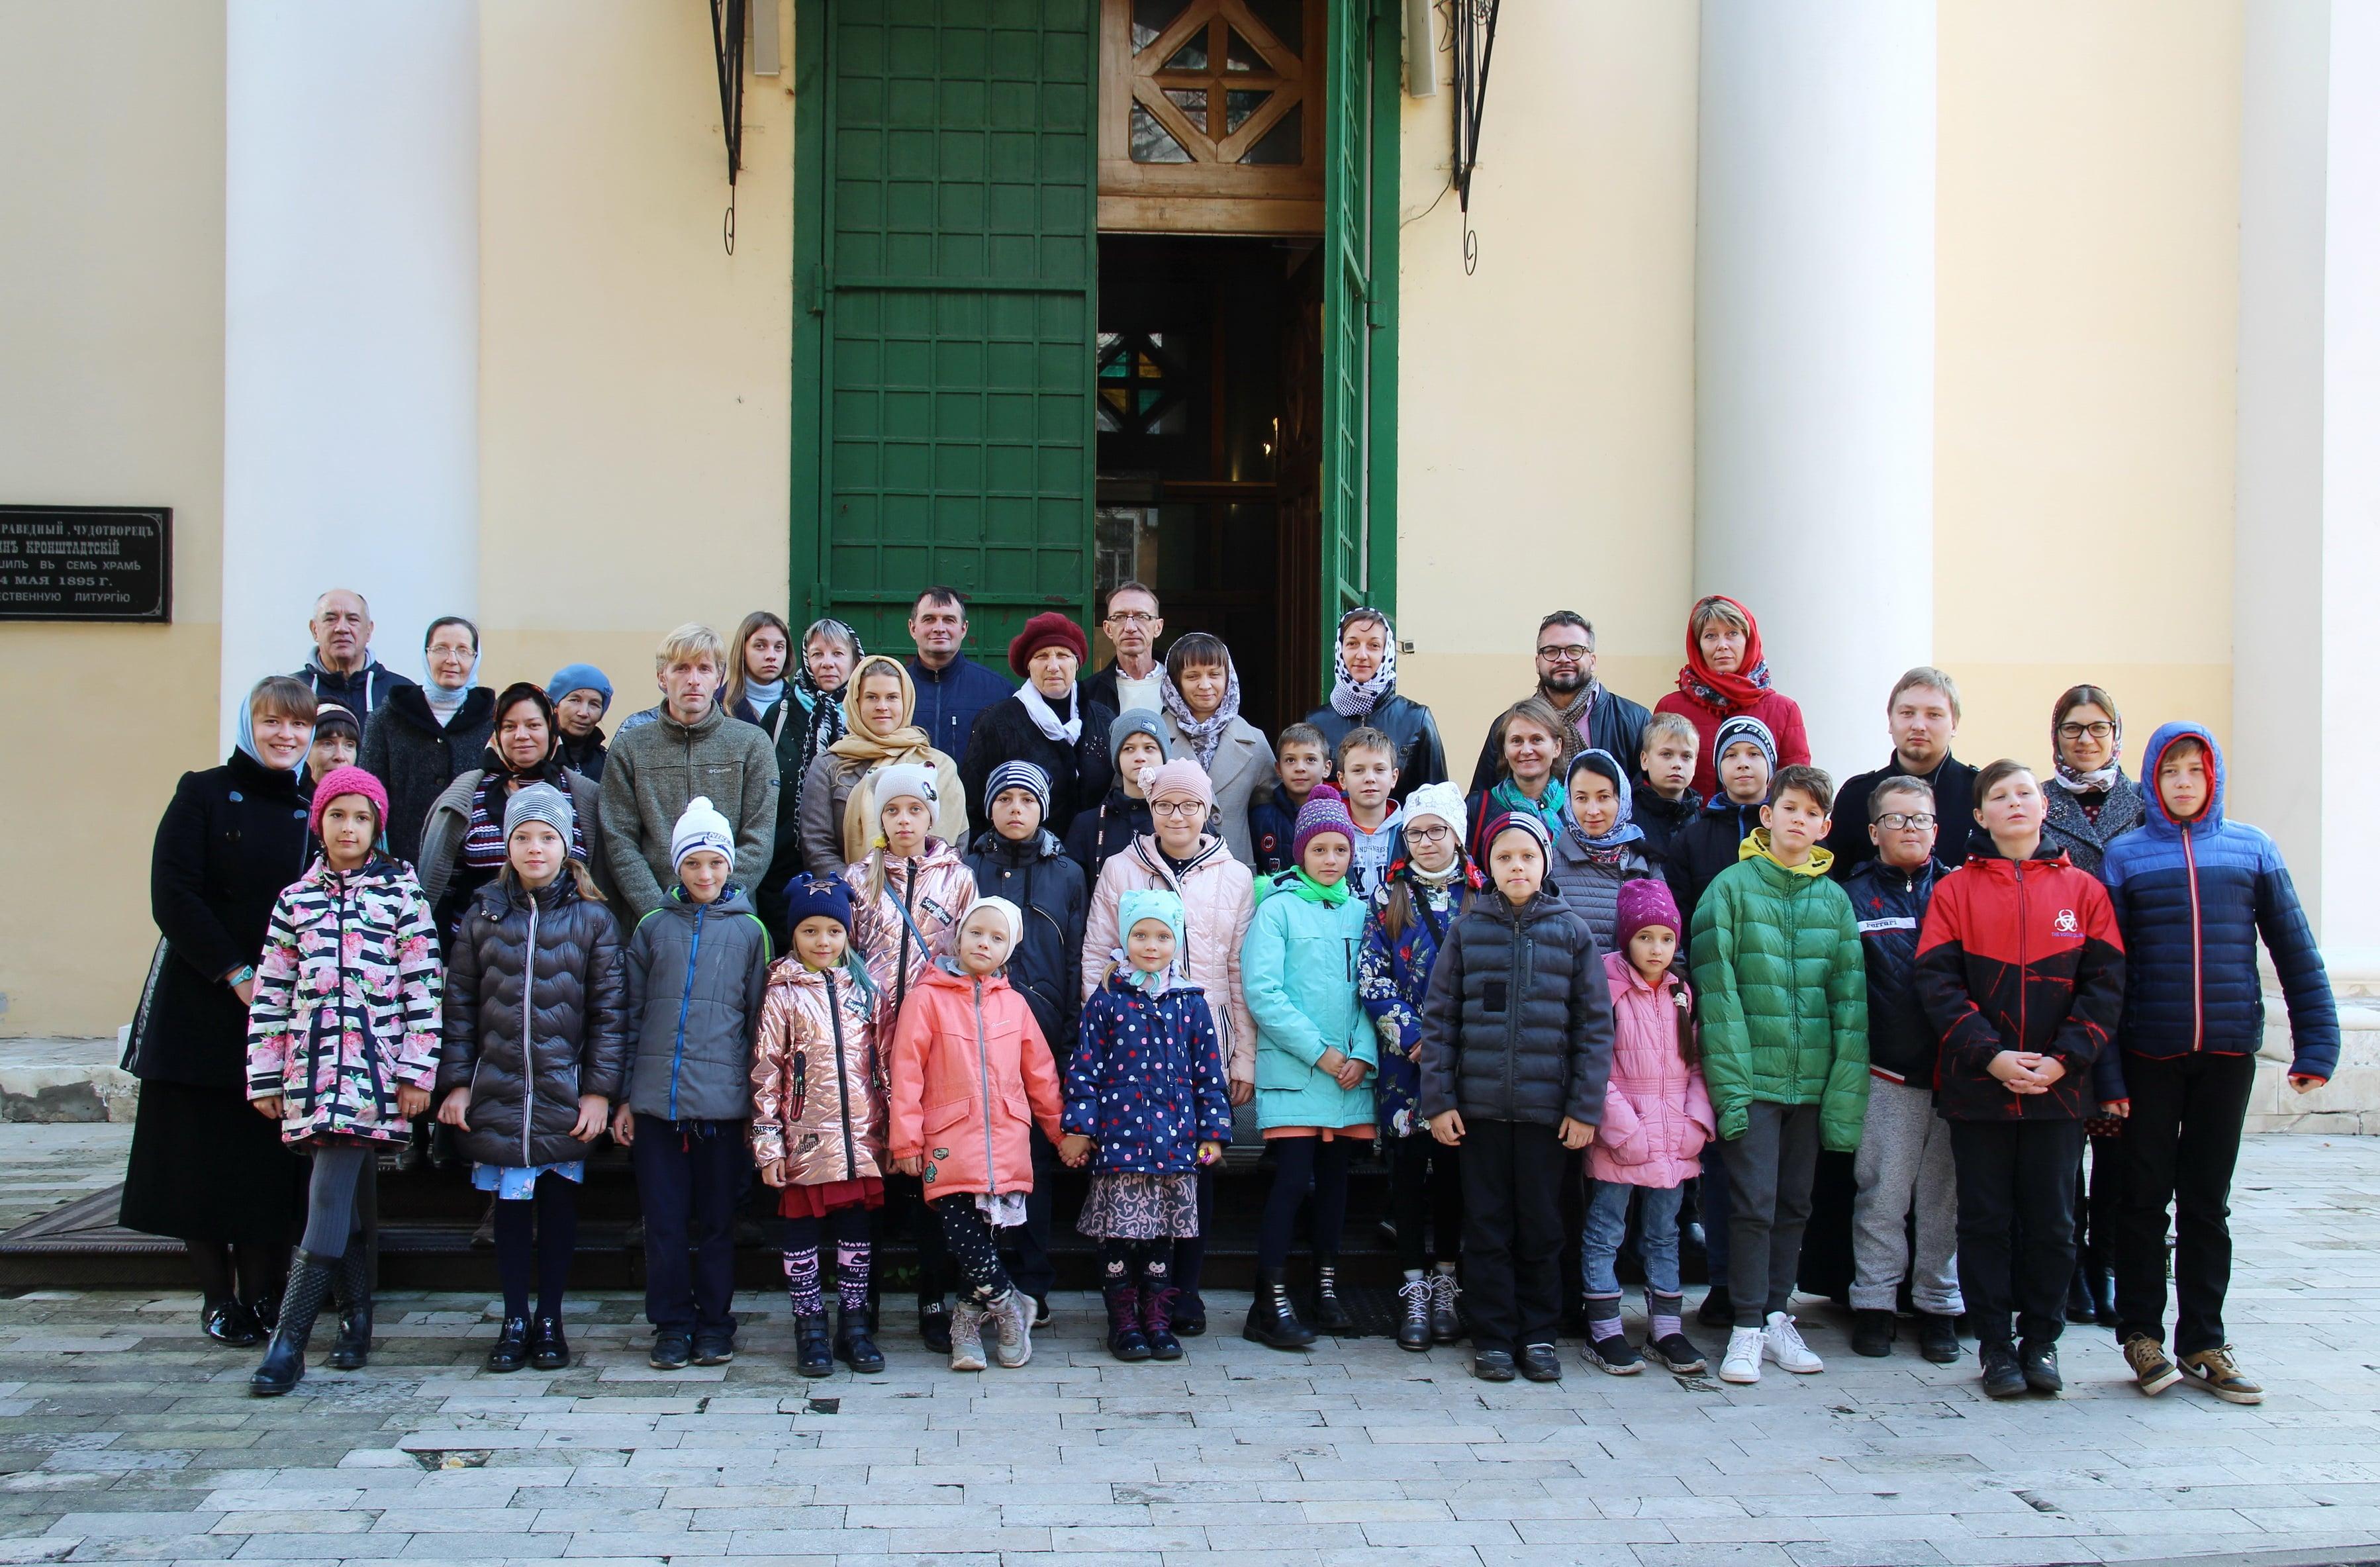 http://monuspen.ru/photoreports/7df66090564ac3621568a9866ab706an.JPG